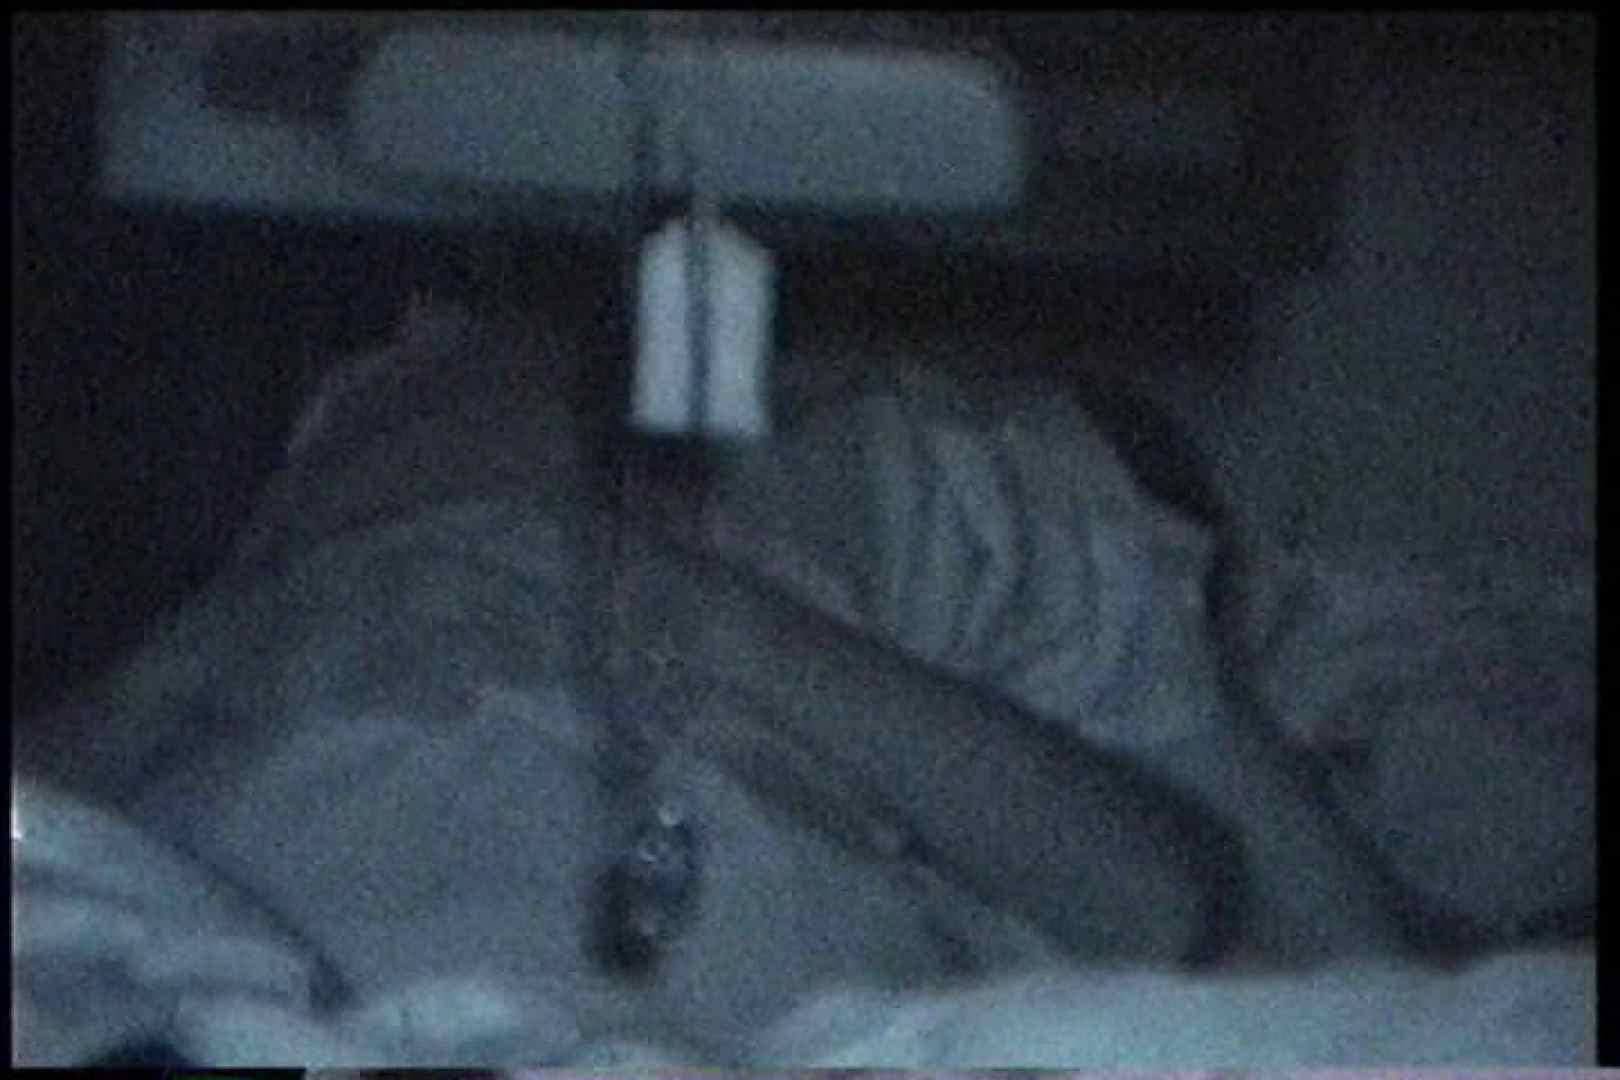 充血監督の深夜の運動会Vol.169 乳首 戯れ無修正画像 71画像 58